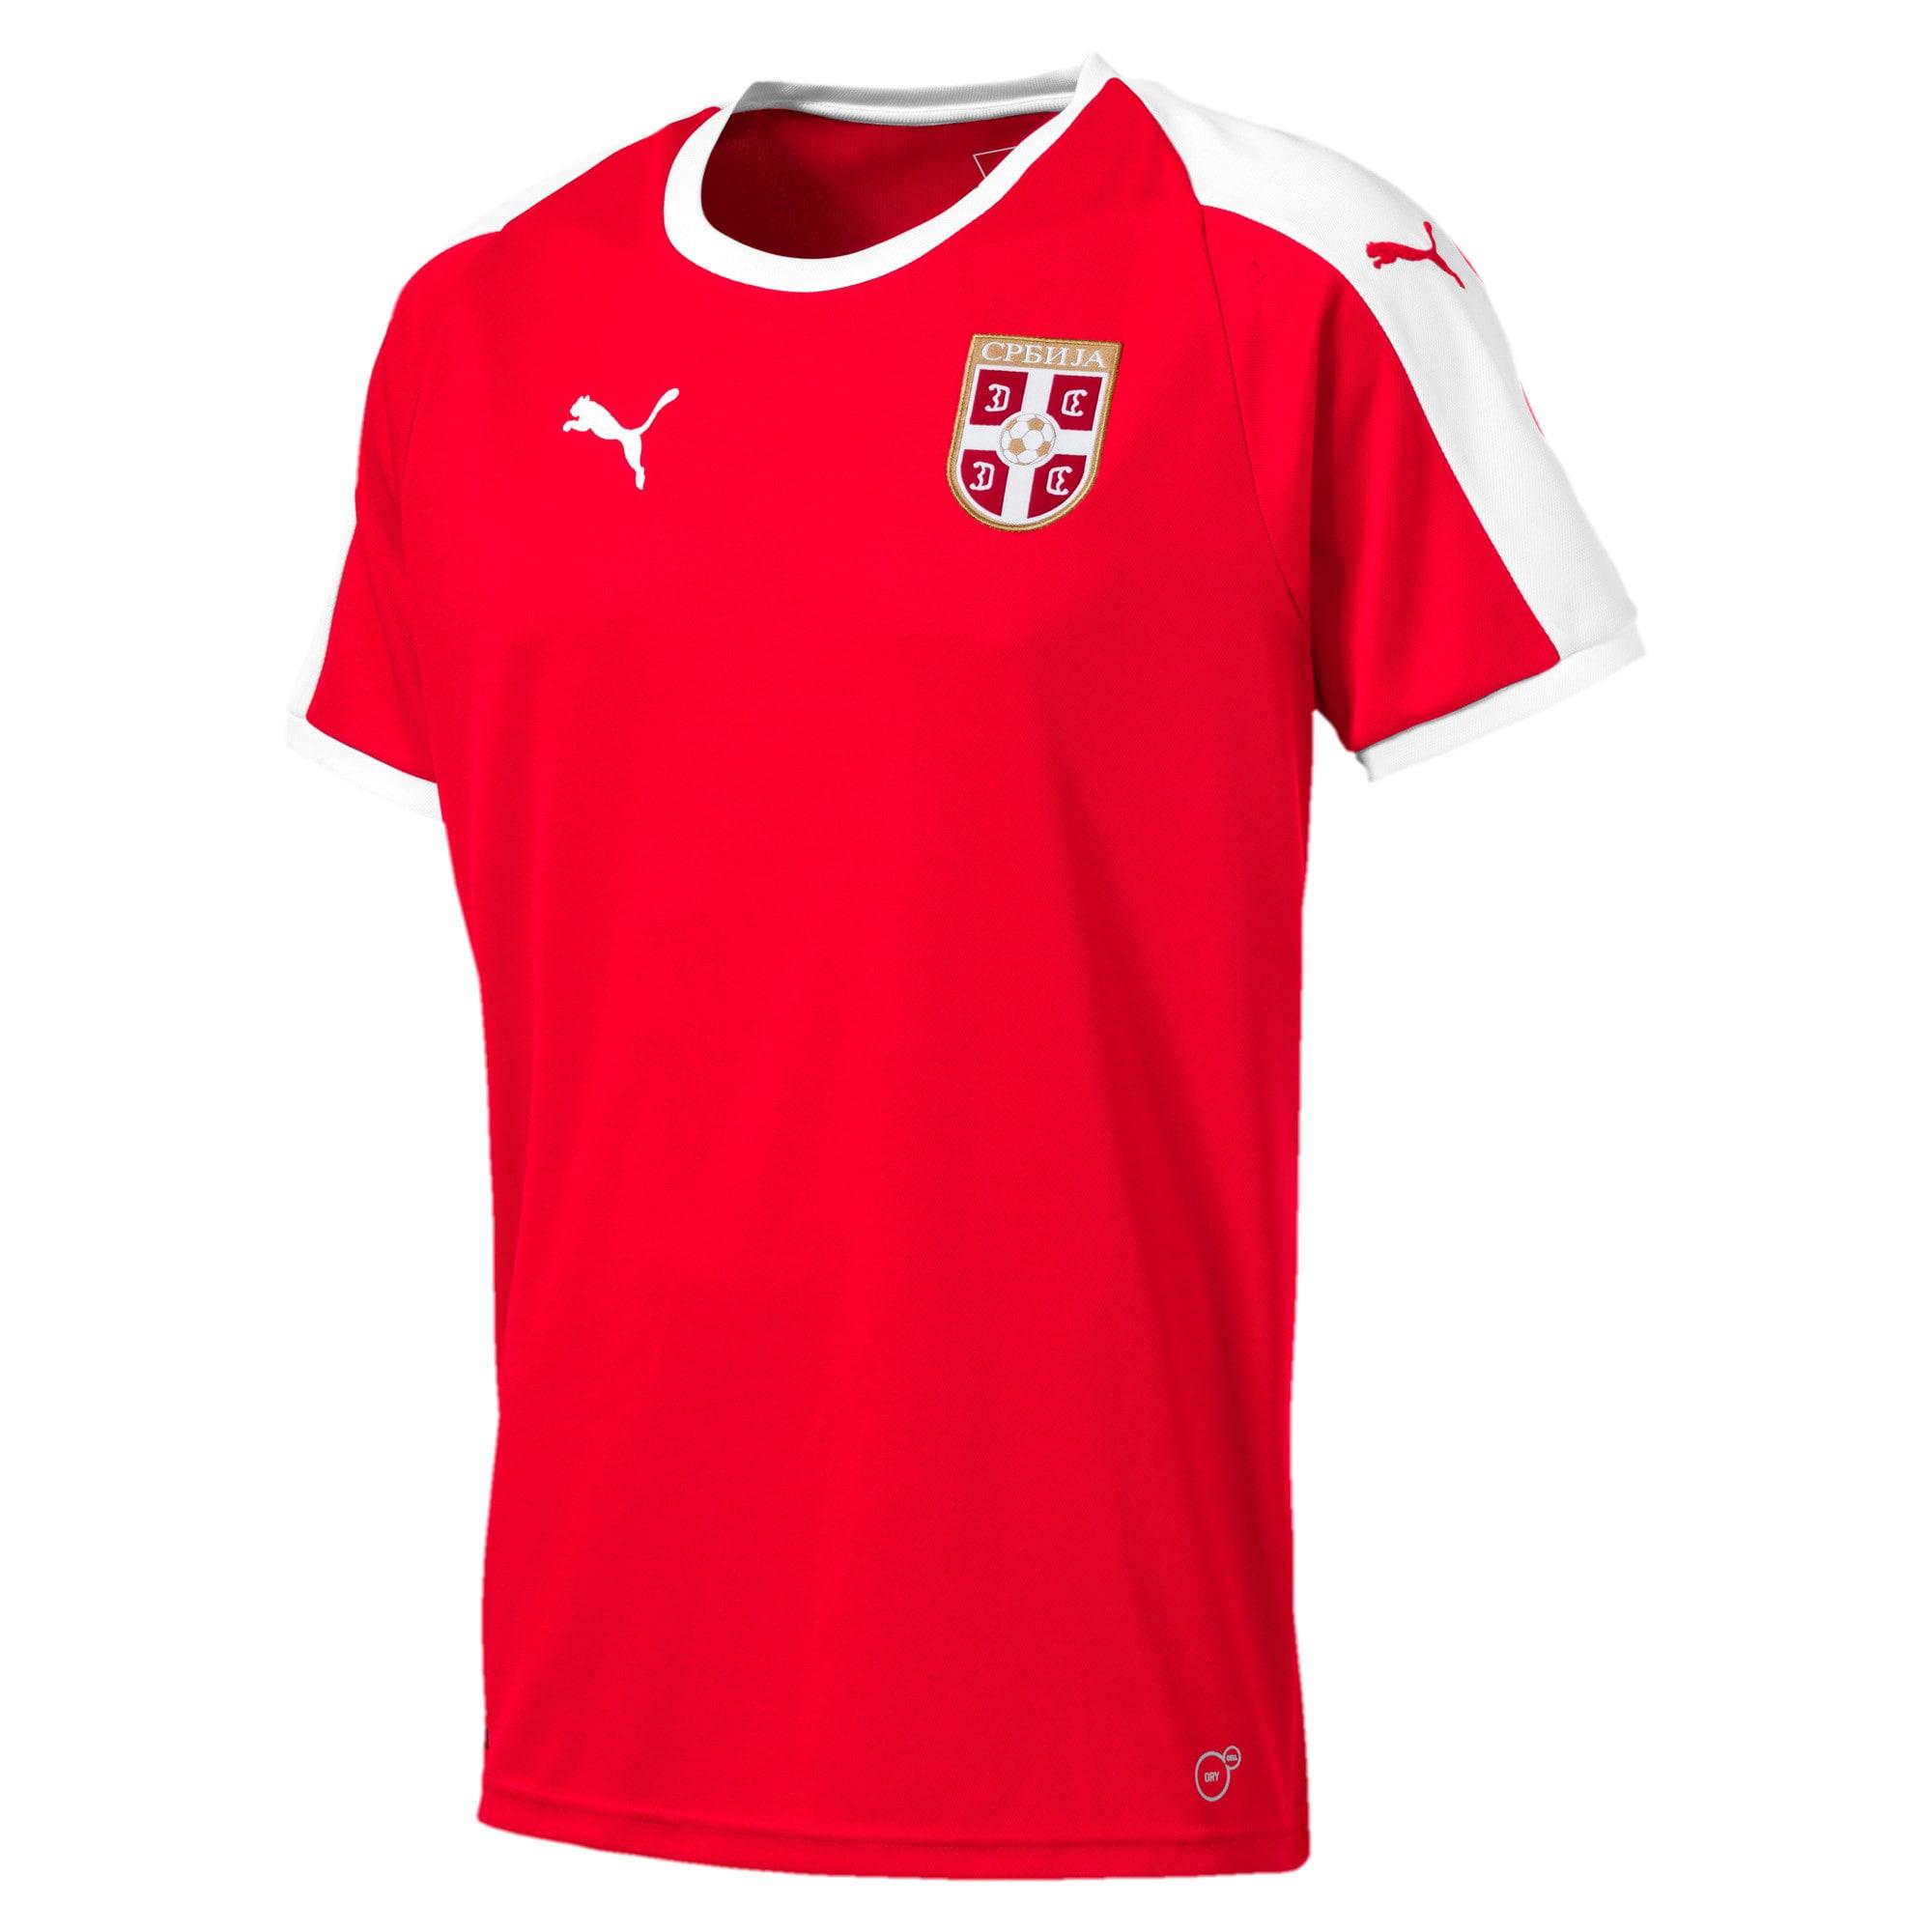 Thumbnail 1 of Serbia Home Shirt, Puma Red-Puma White, medium